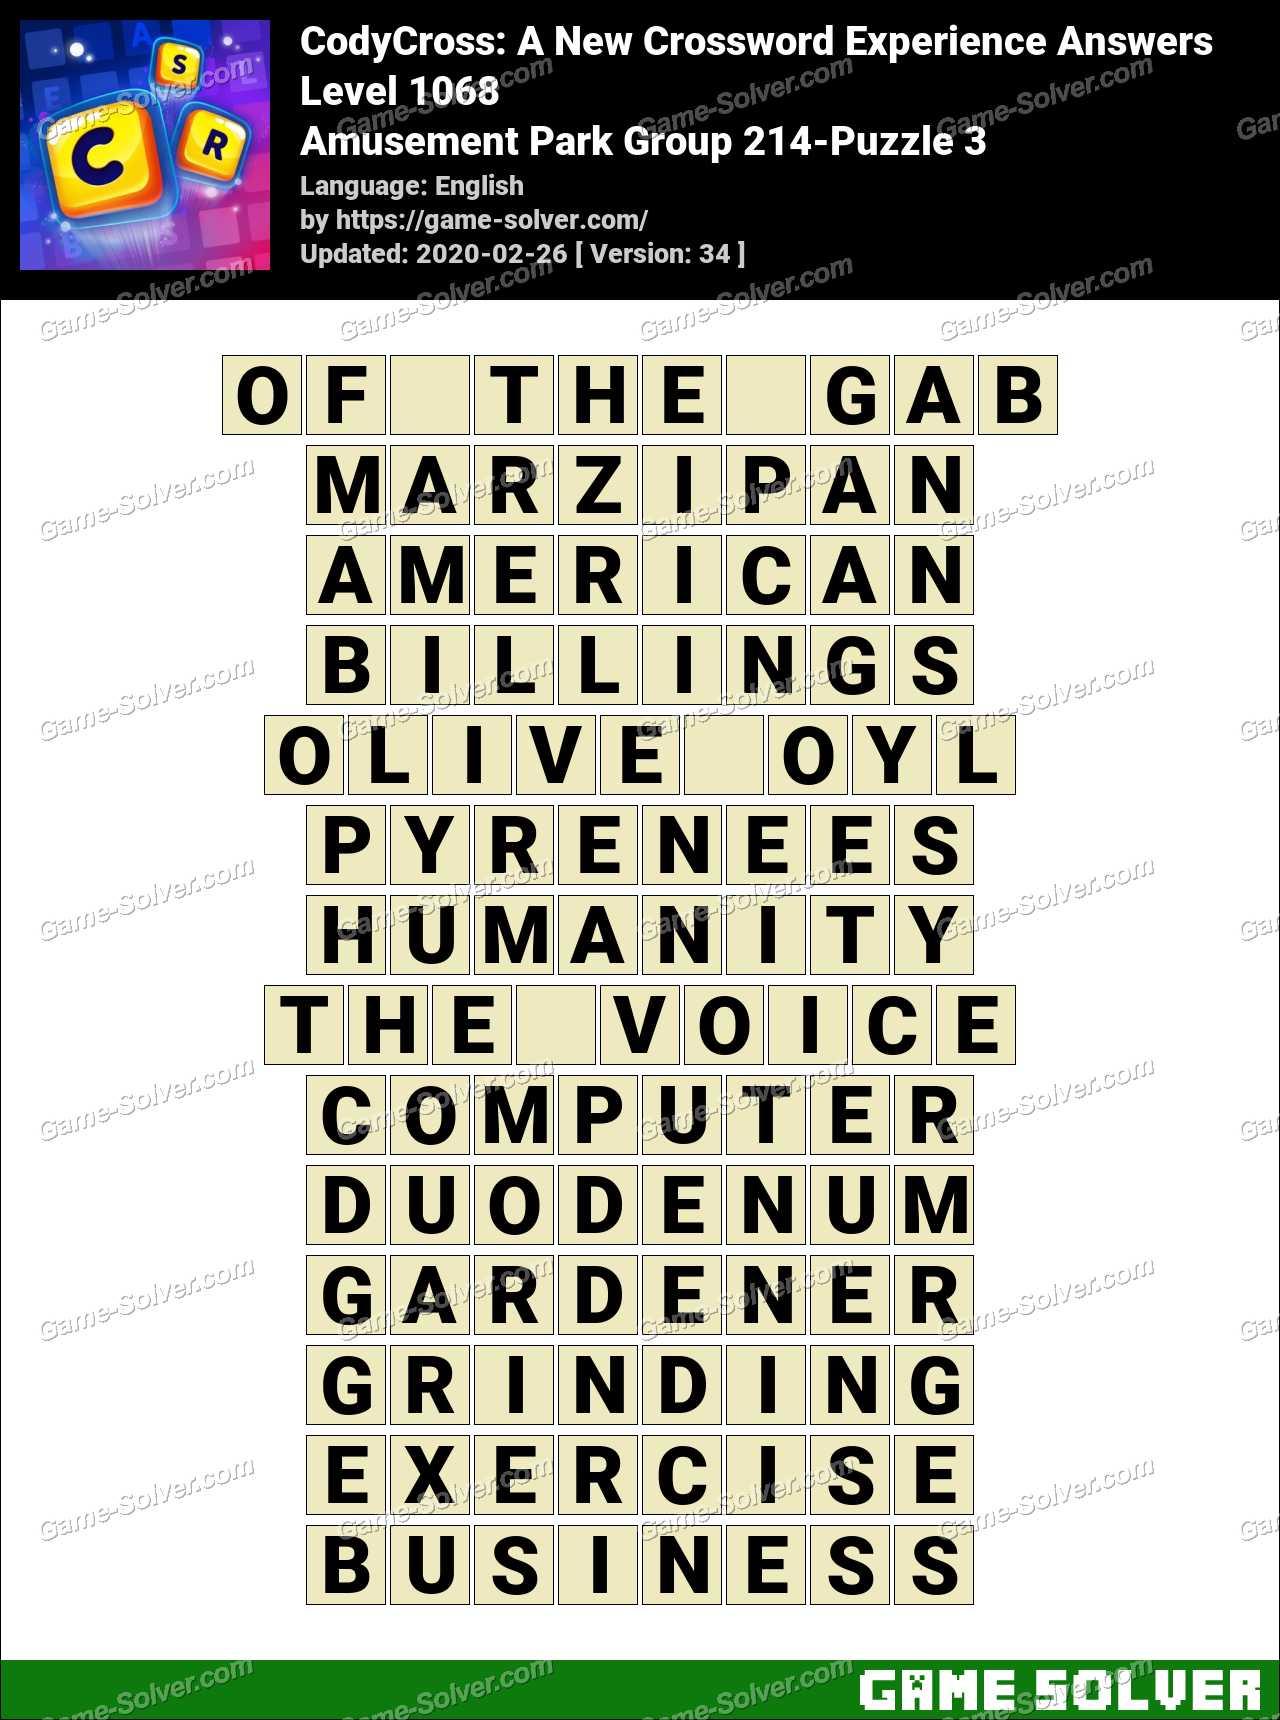 CodyCross Amusement Park Group 214-Puzzle 3 Answers